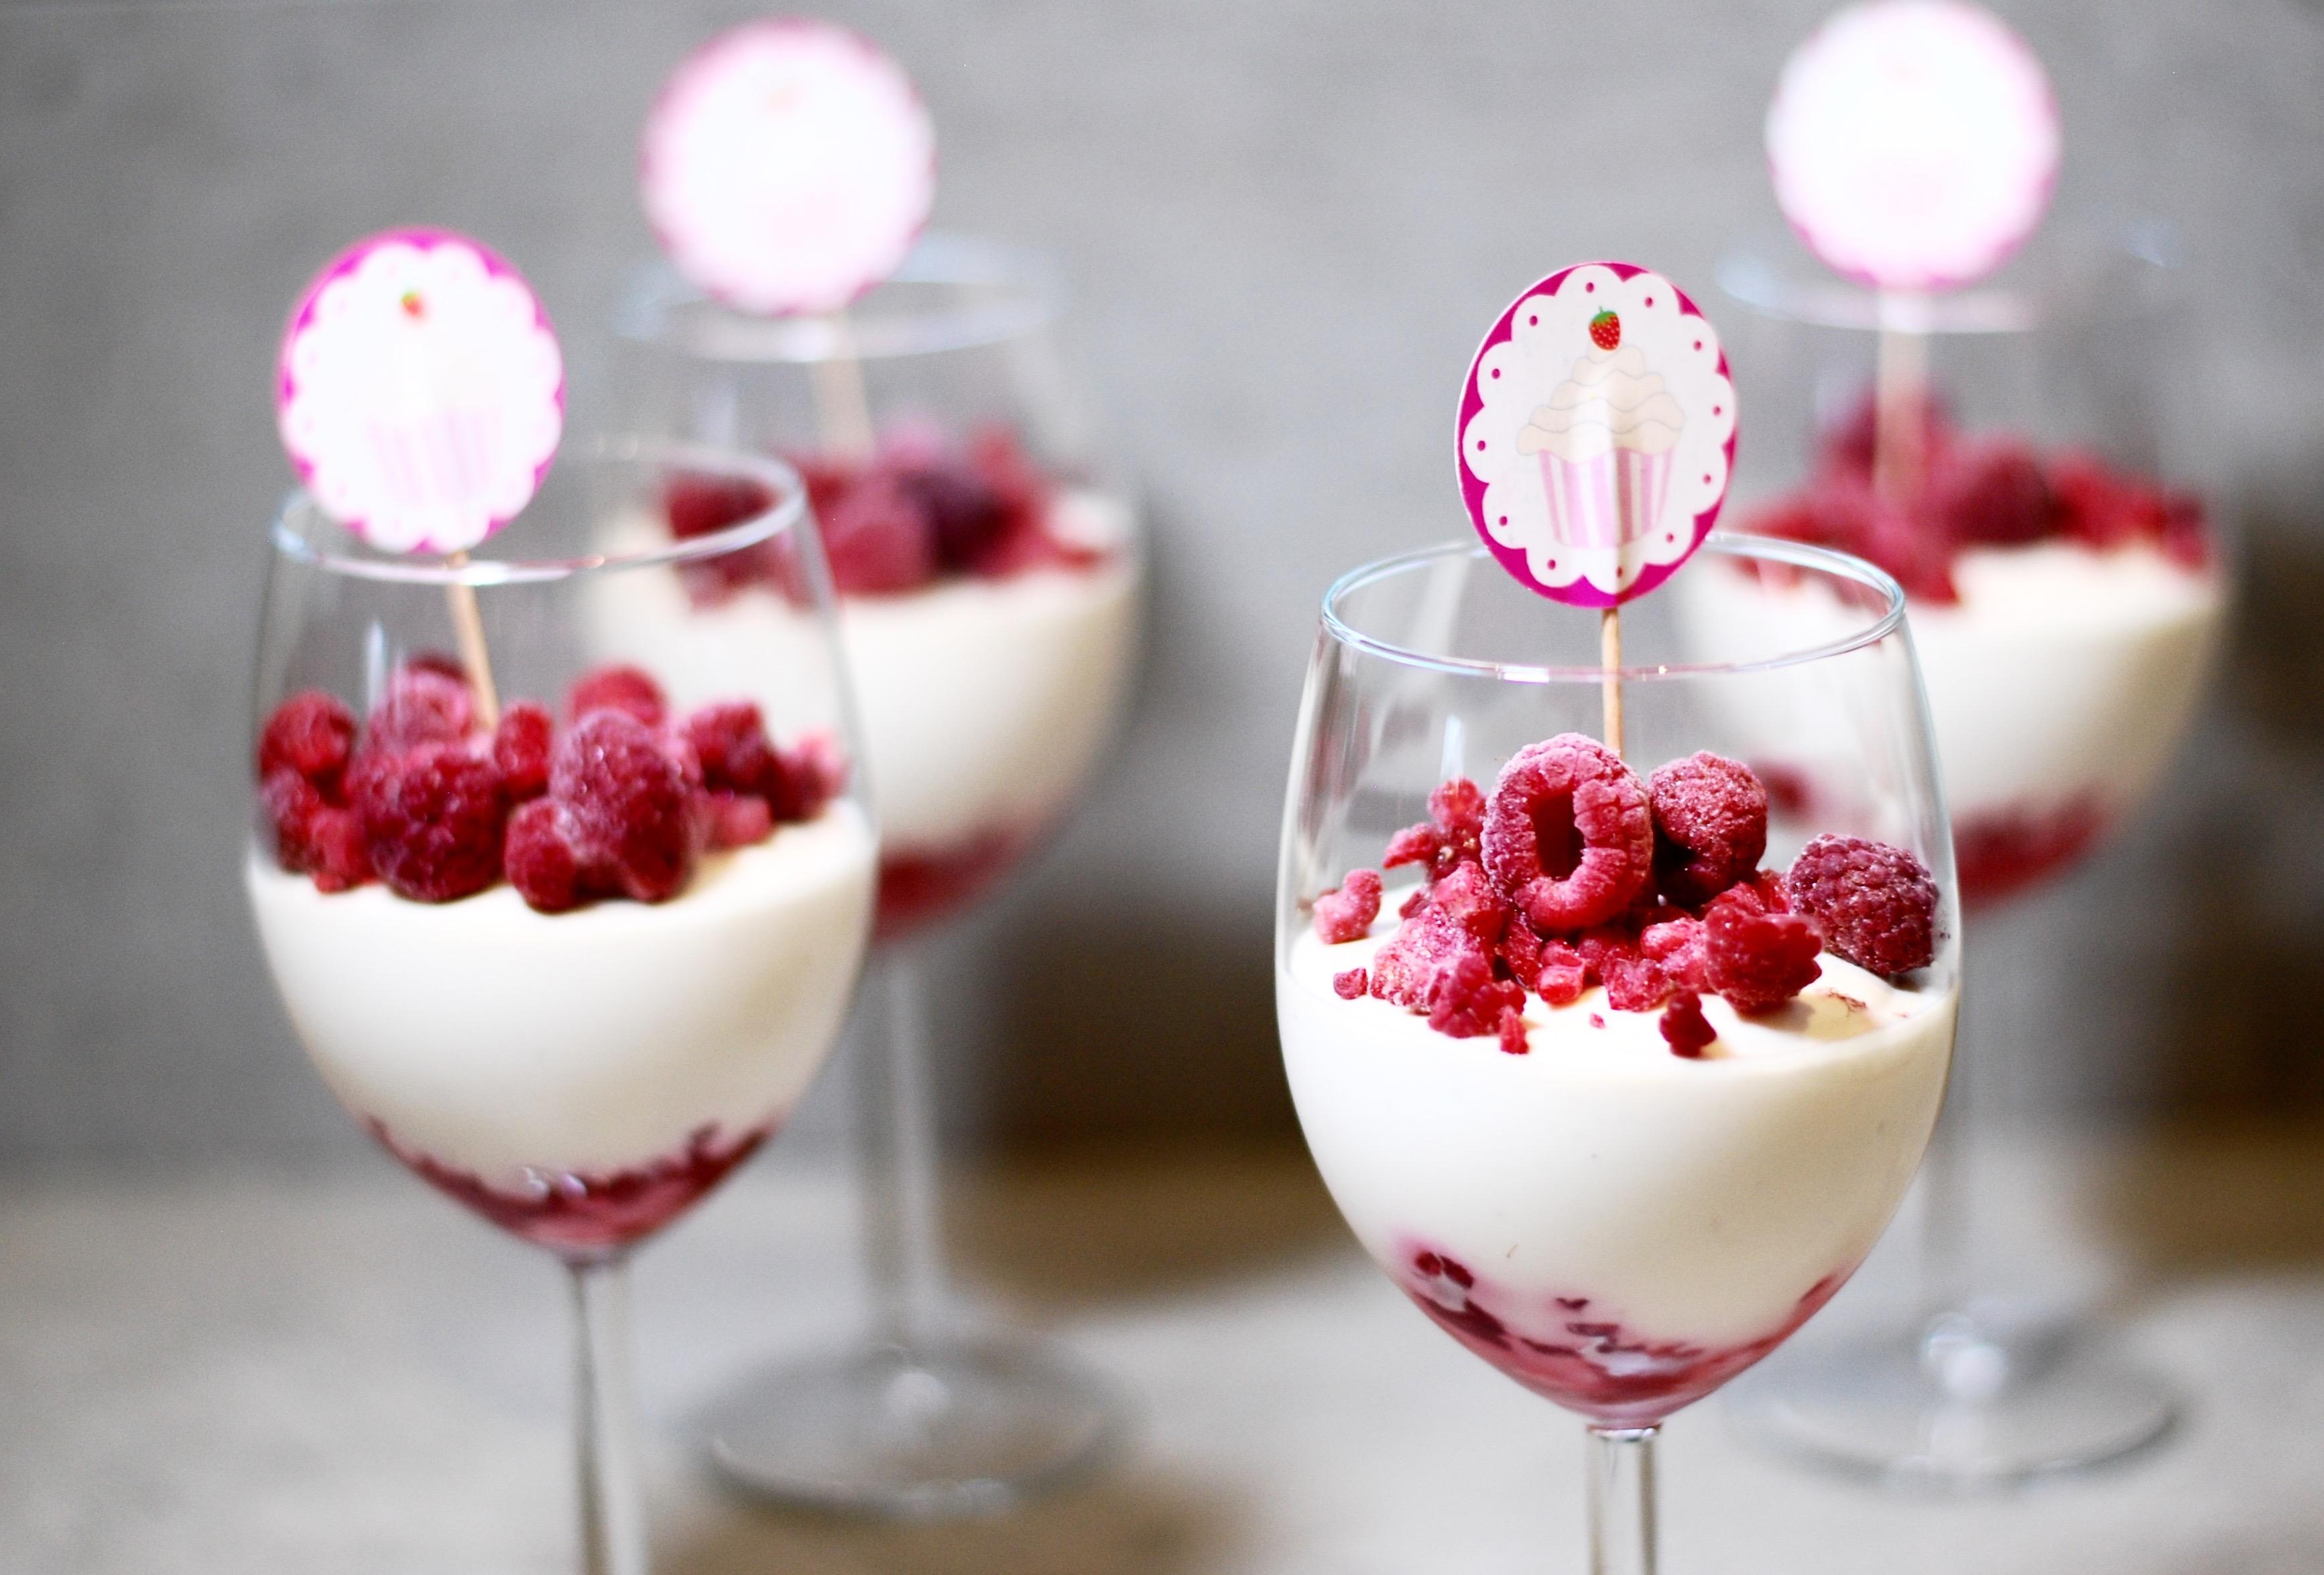 vit choklad dessert i glas